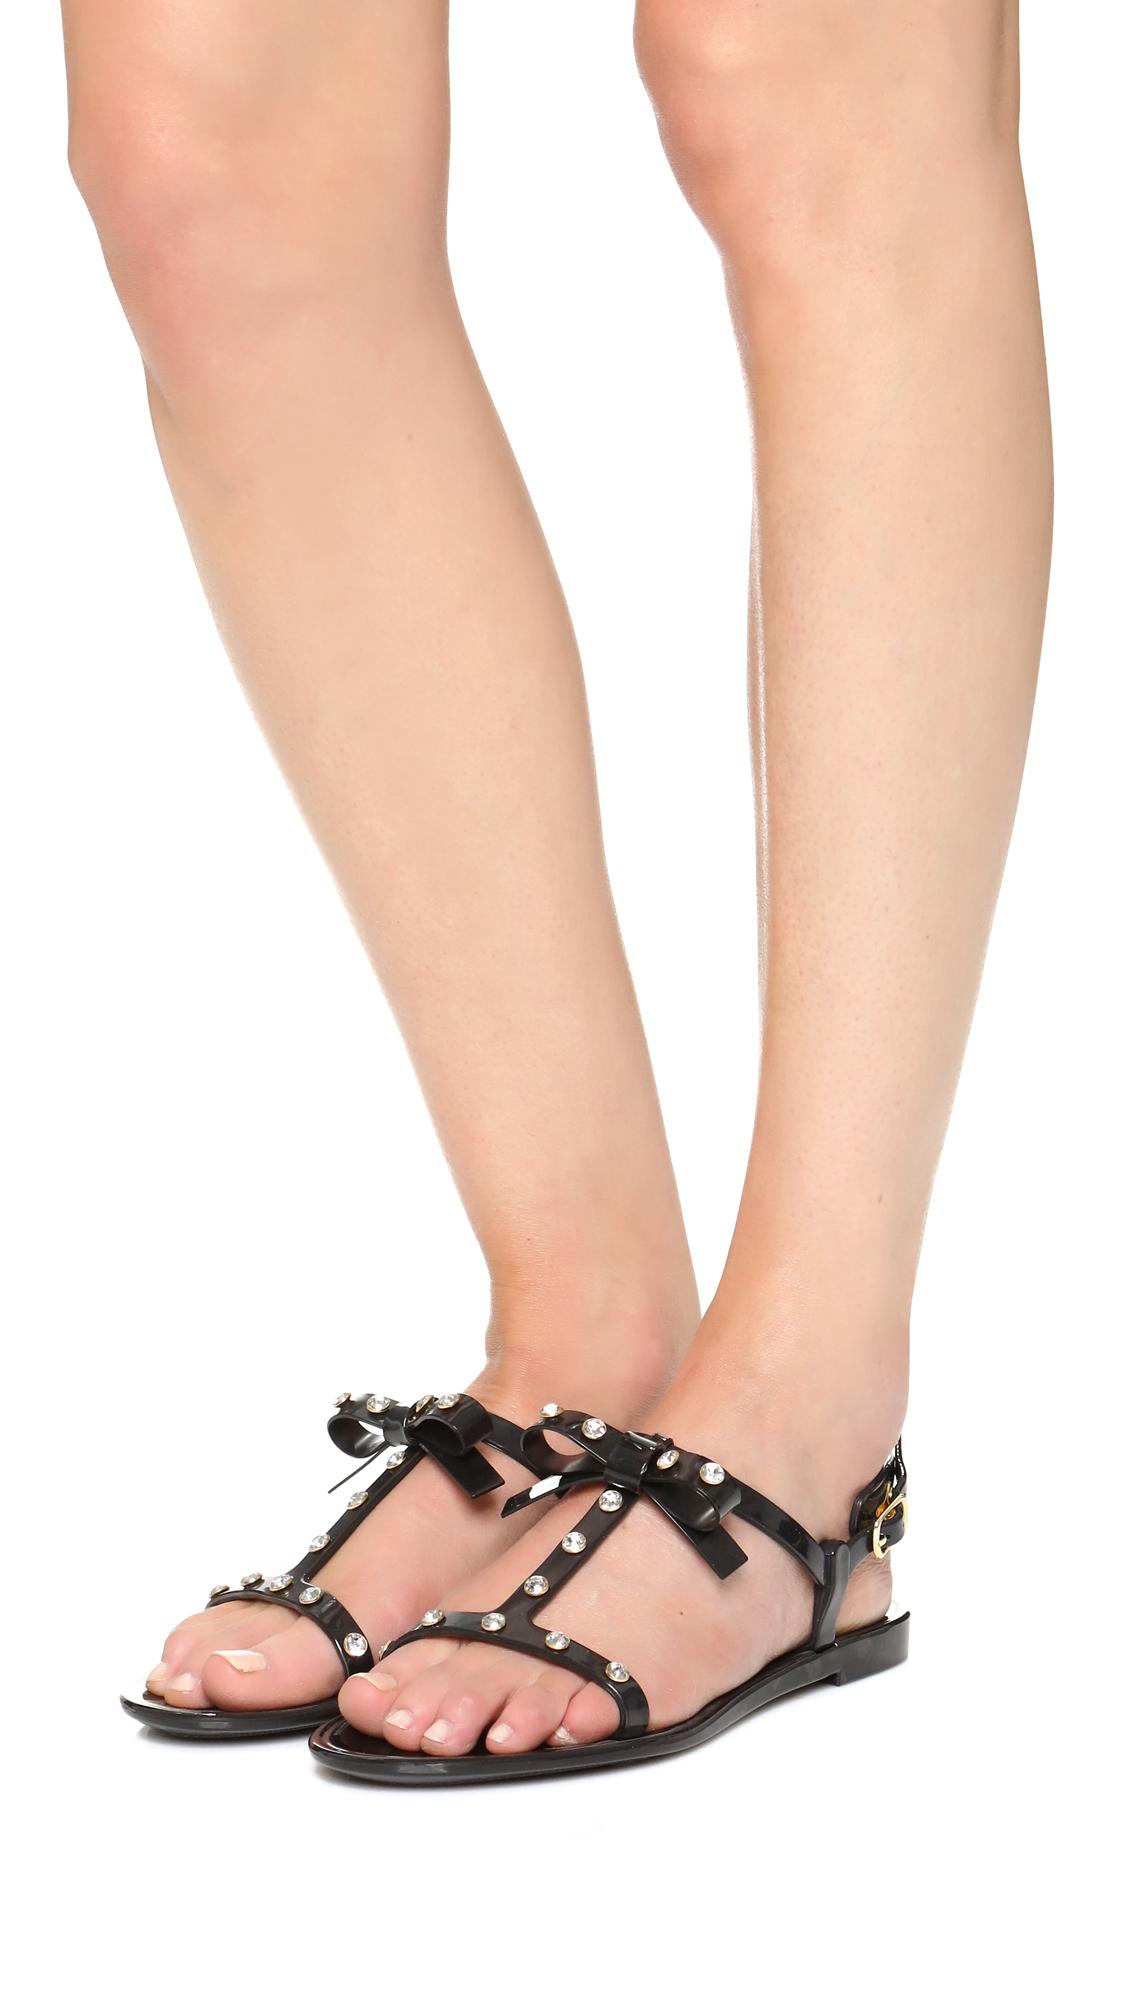 154e35789707b5 Valentino Jelly Bow Sandals Black.Valentino Rockstud Jelly Sandals ...